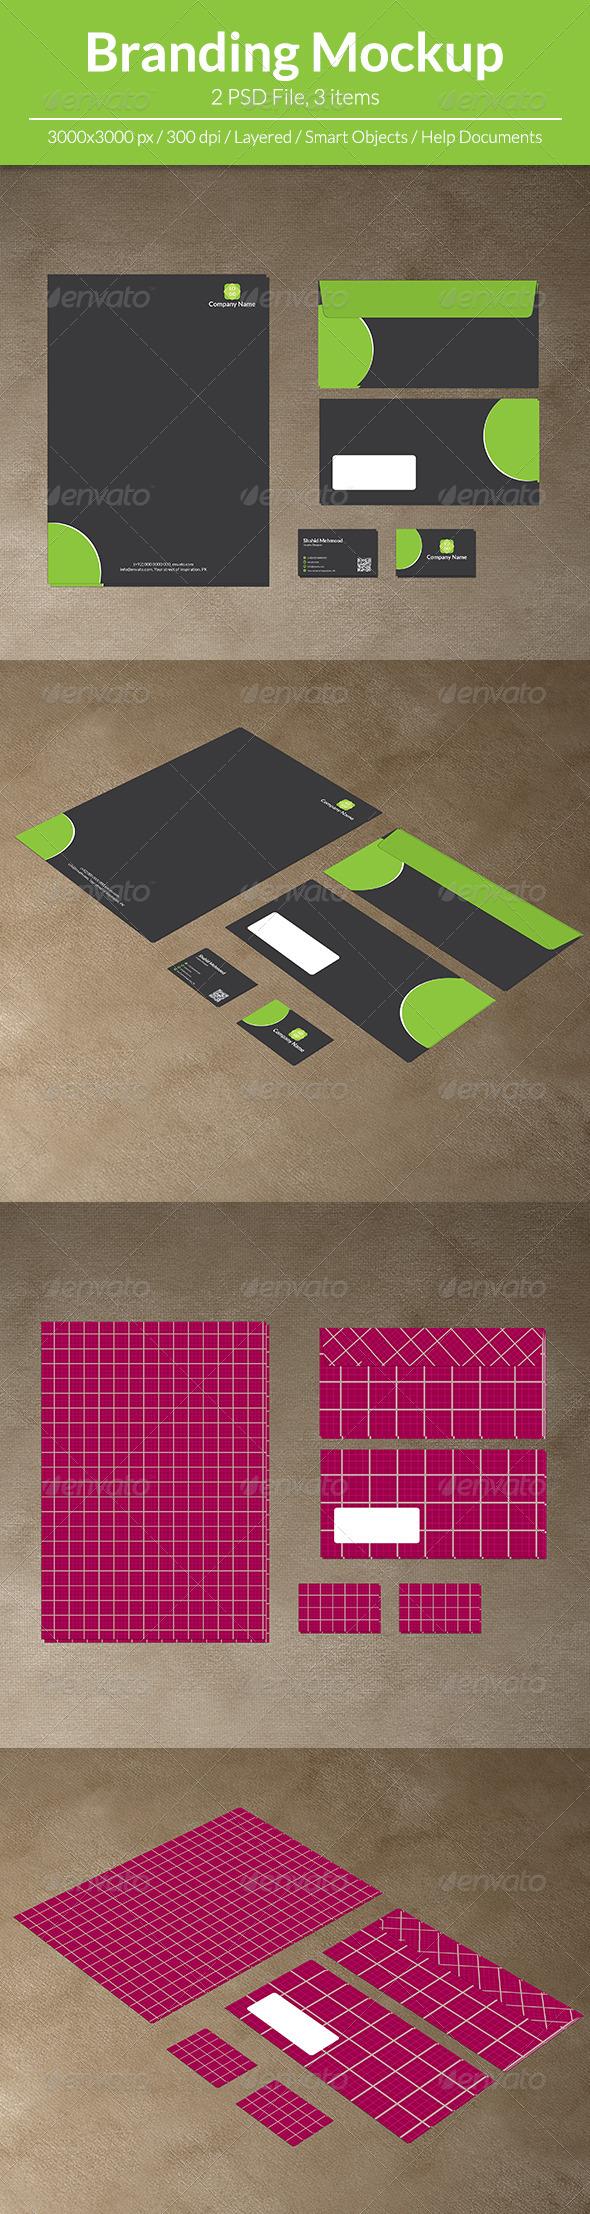 GraphicRiver Branding Mockup 7255180